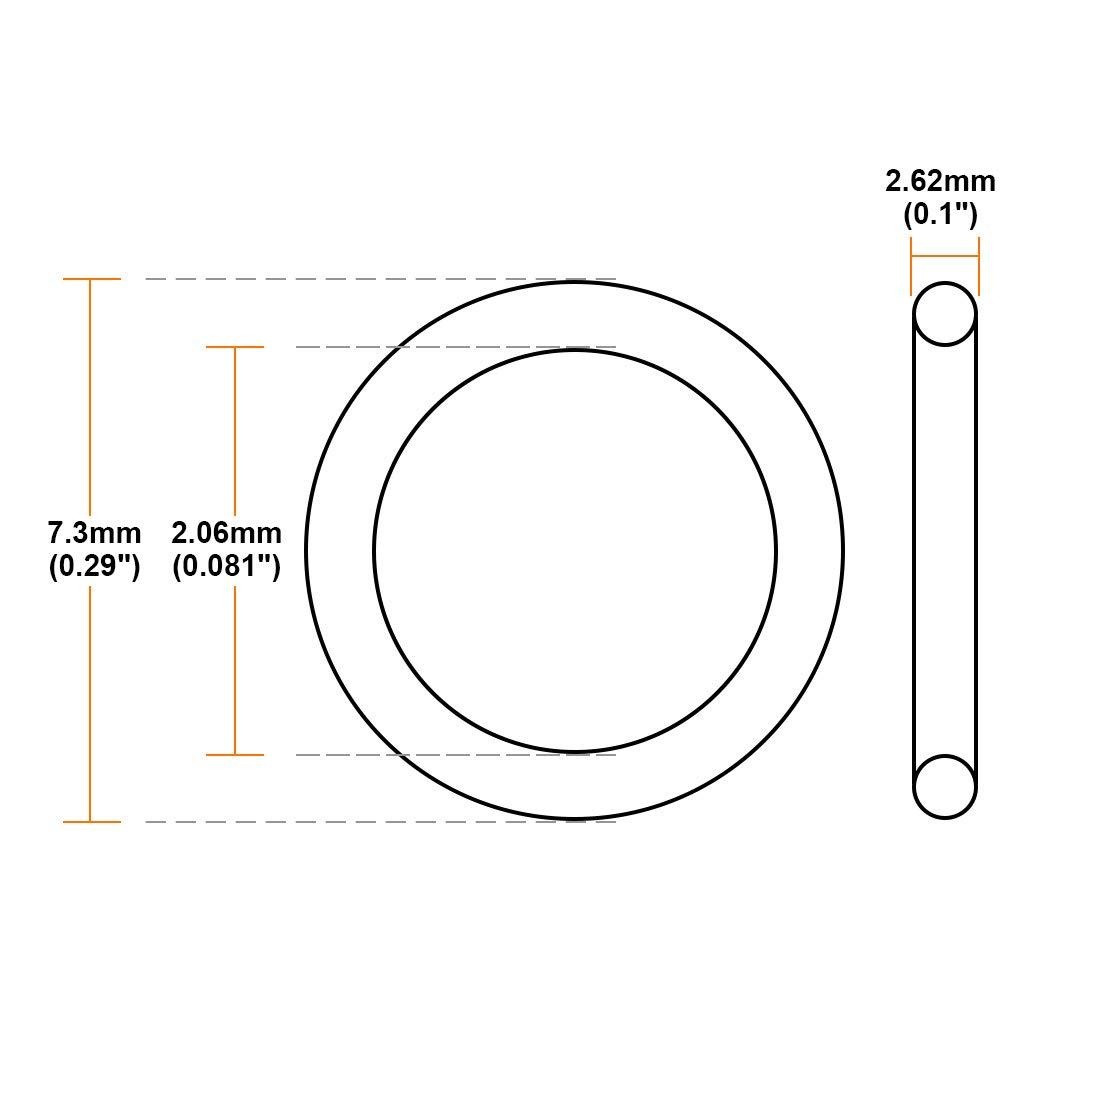 O Ring Nitrilkautschuk 1,24mm-22,22mm Innendurchm sourcing map 25Stk 2,62mm Breite Dichtung 15,54 mm x 20,78 mm x 2,62 mm